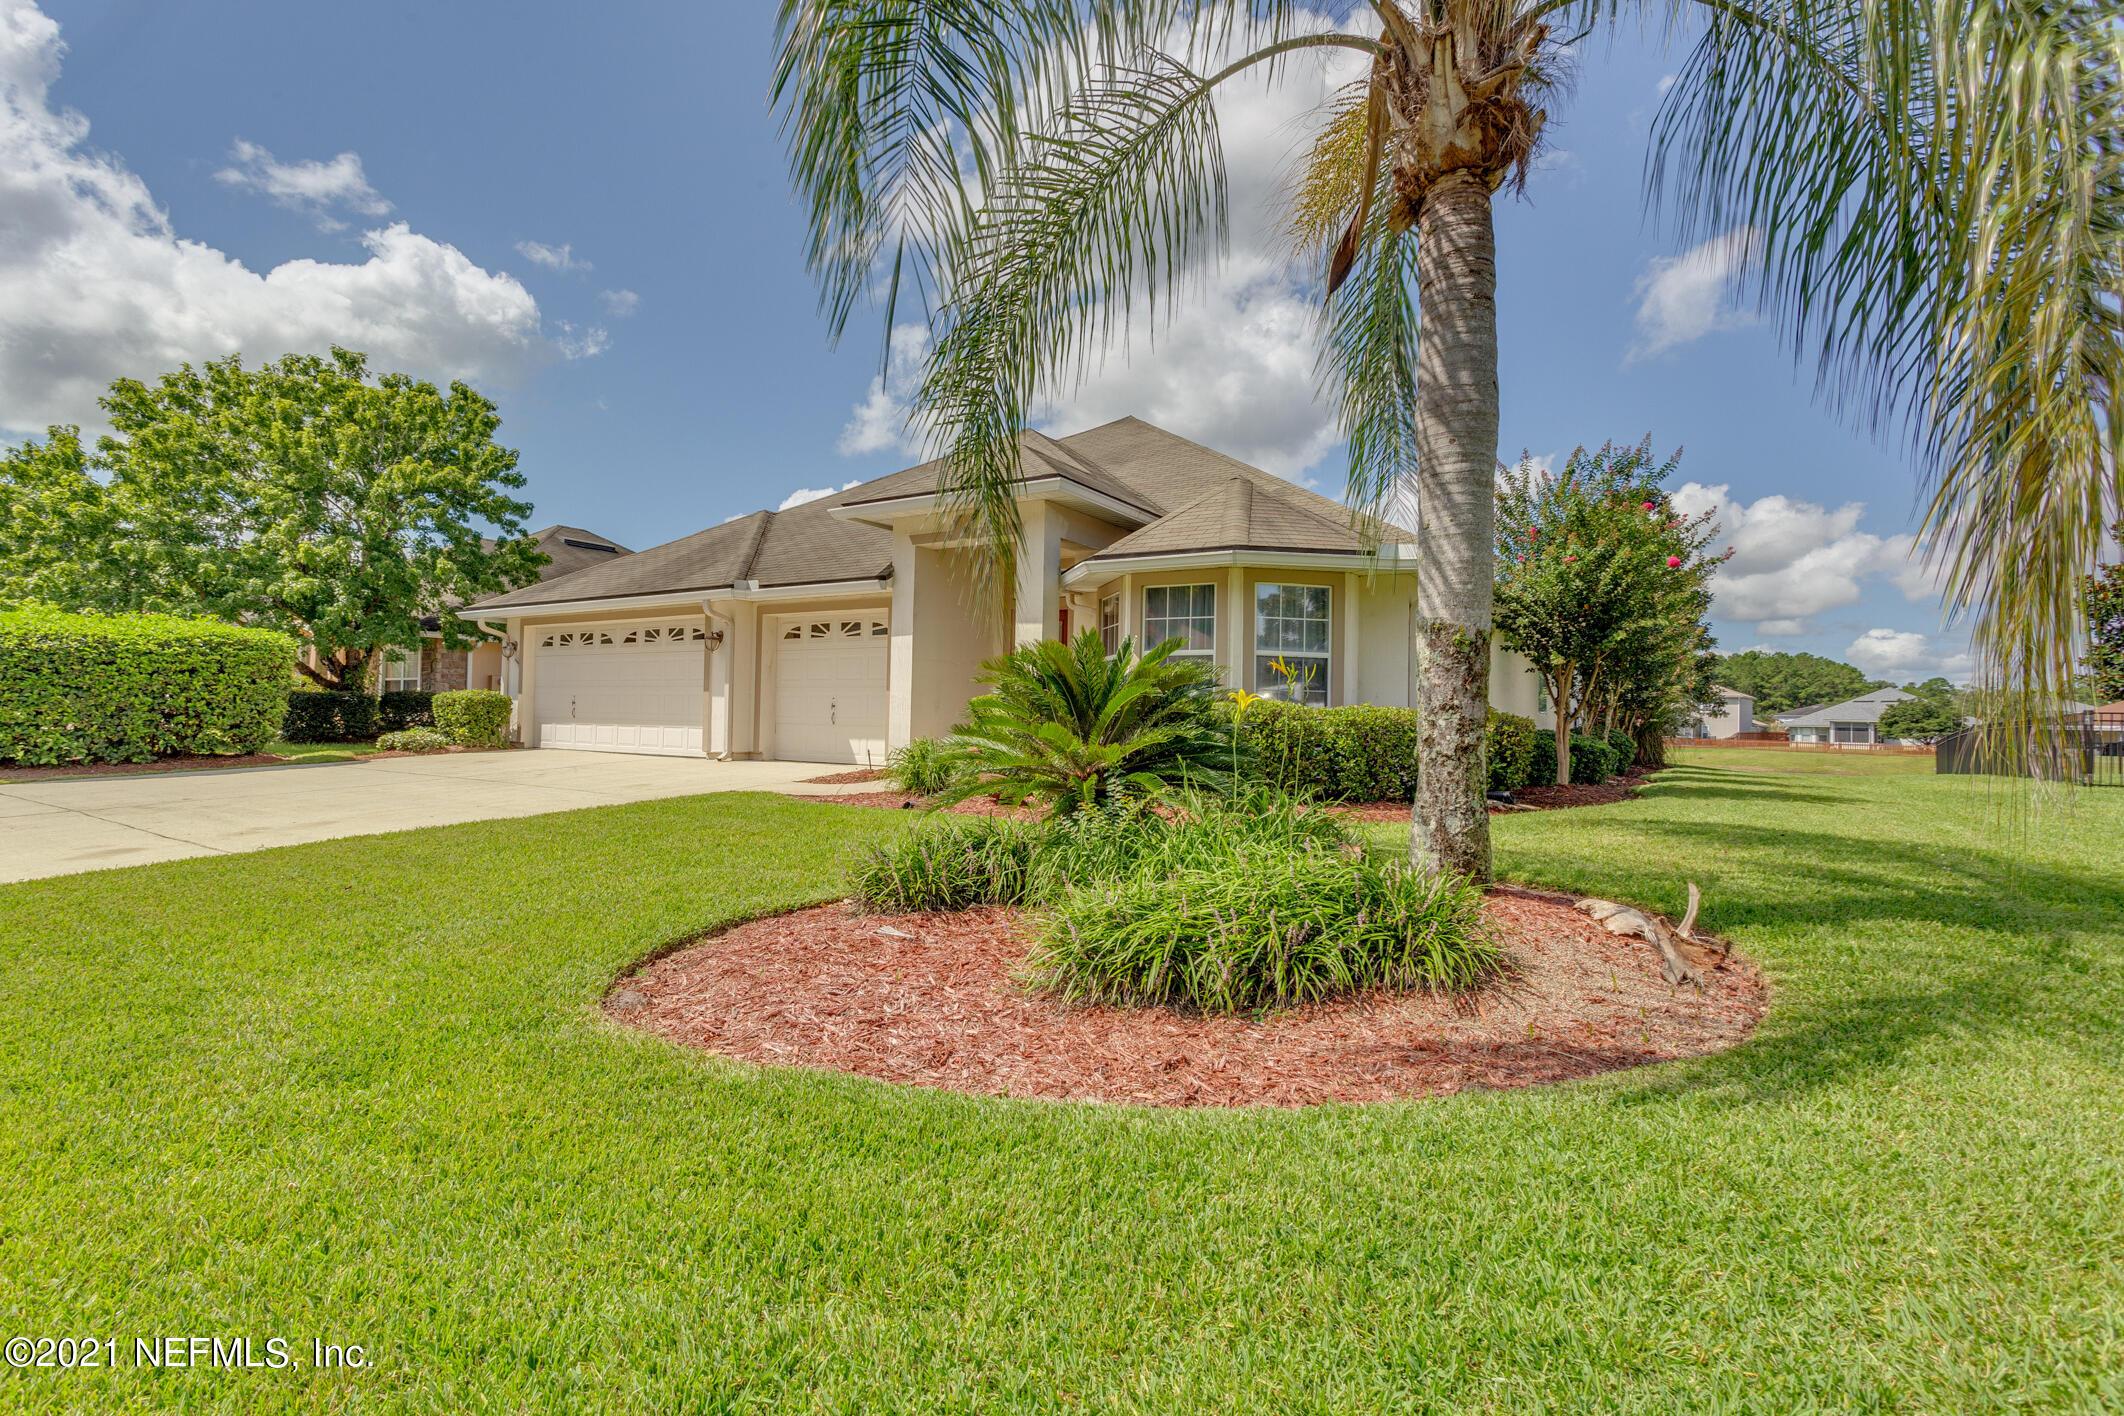 1791 HOLLOW GLEN, MIDDLEBURG, FLORIDA 32068, 4 Bedrooms Bedrooms, ,3 BathroomsBathrooms,Residential,For sale,HOLLOW GLEN,1128535